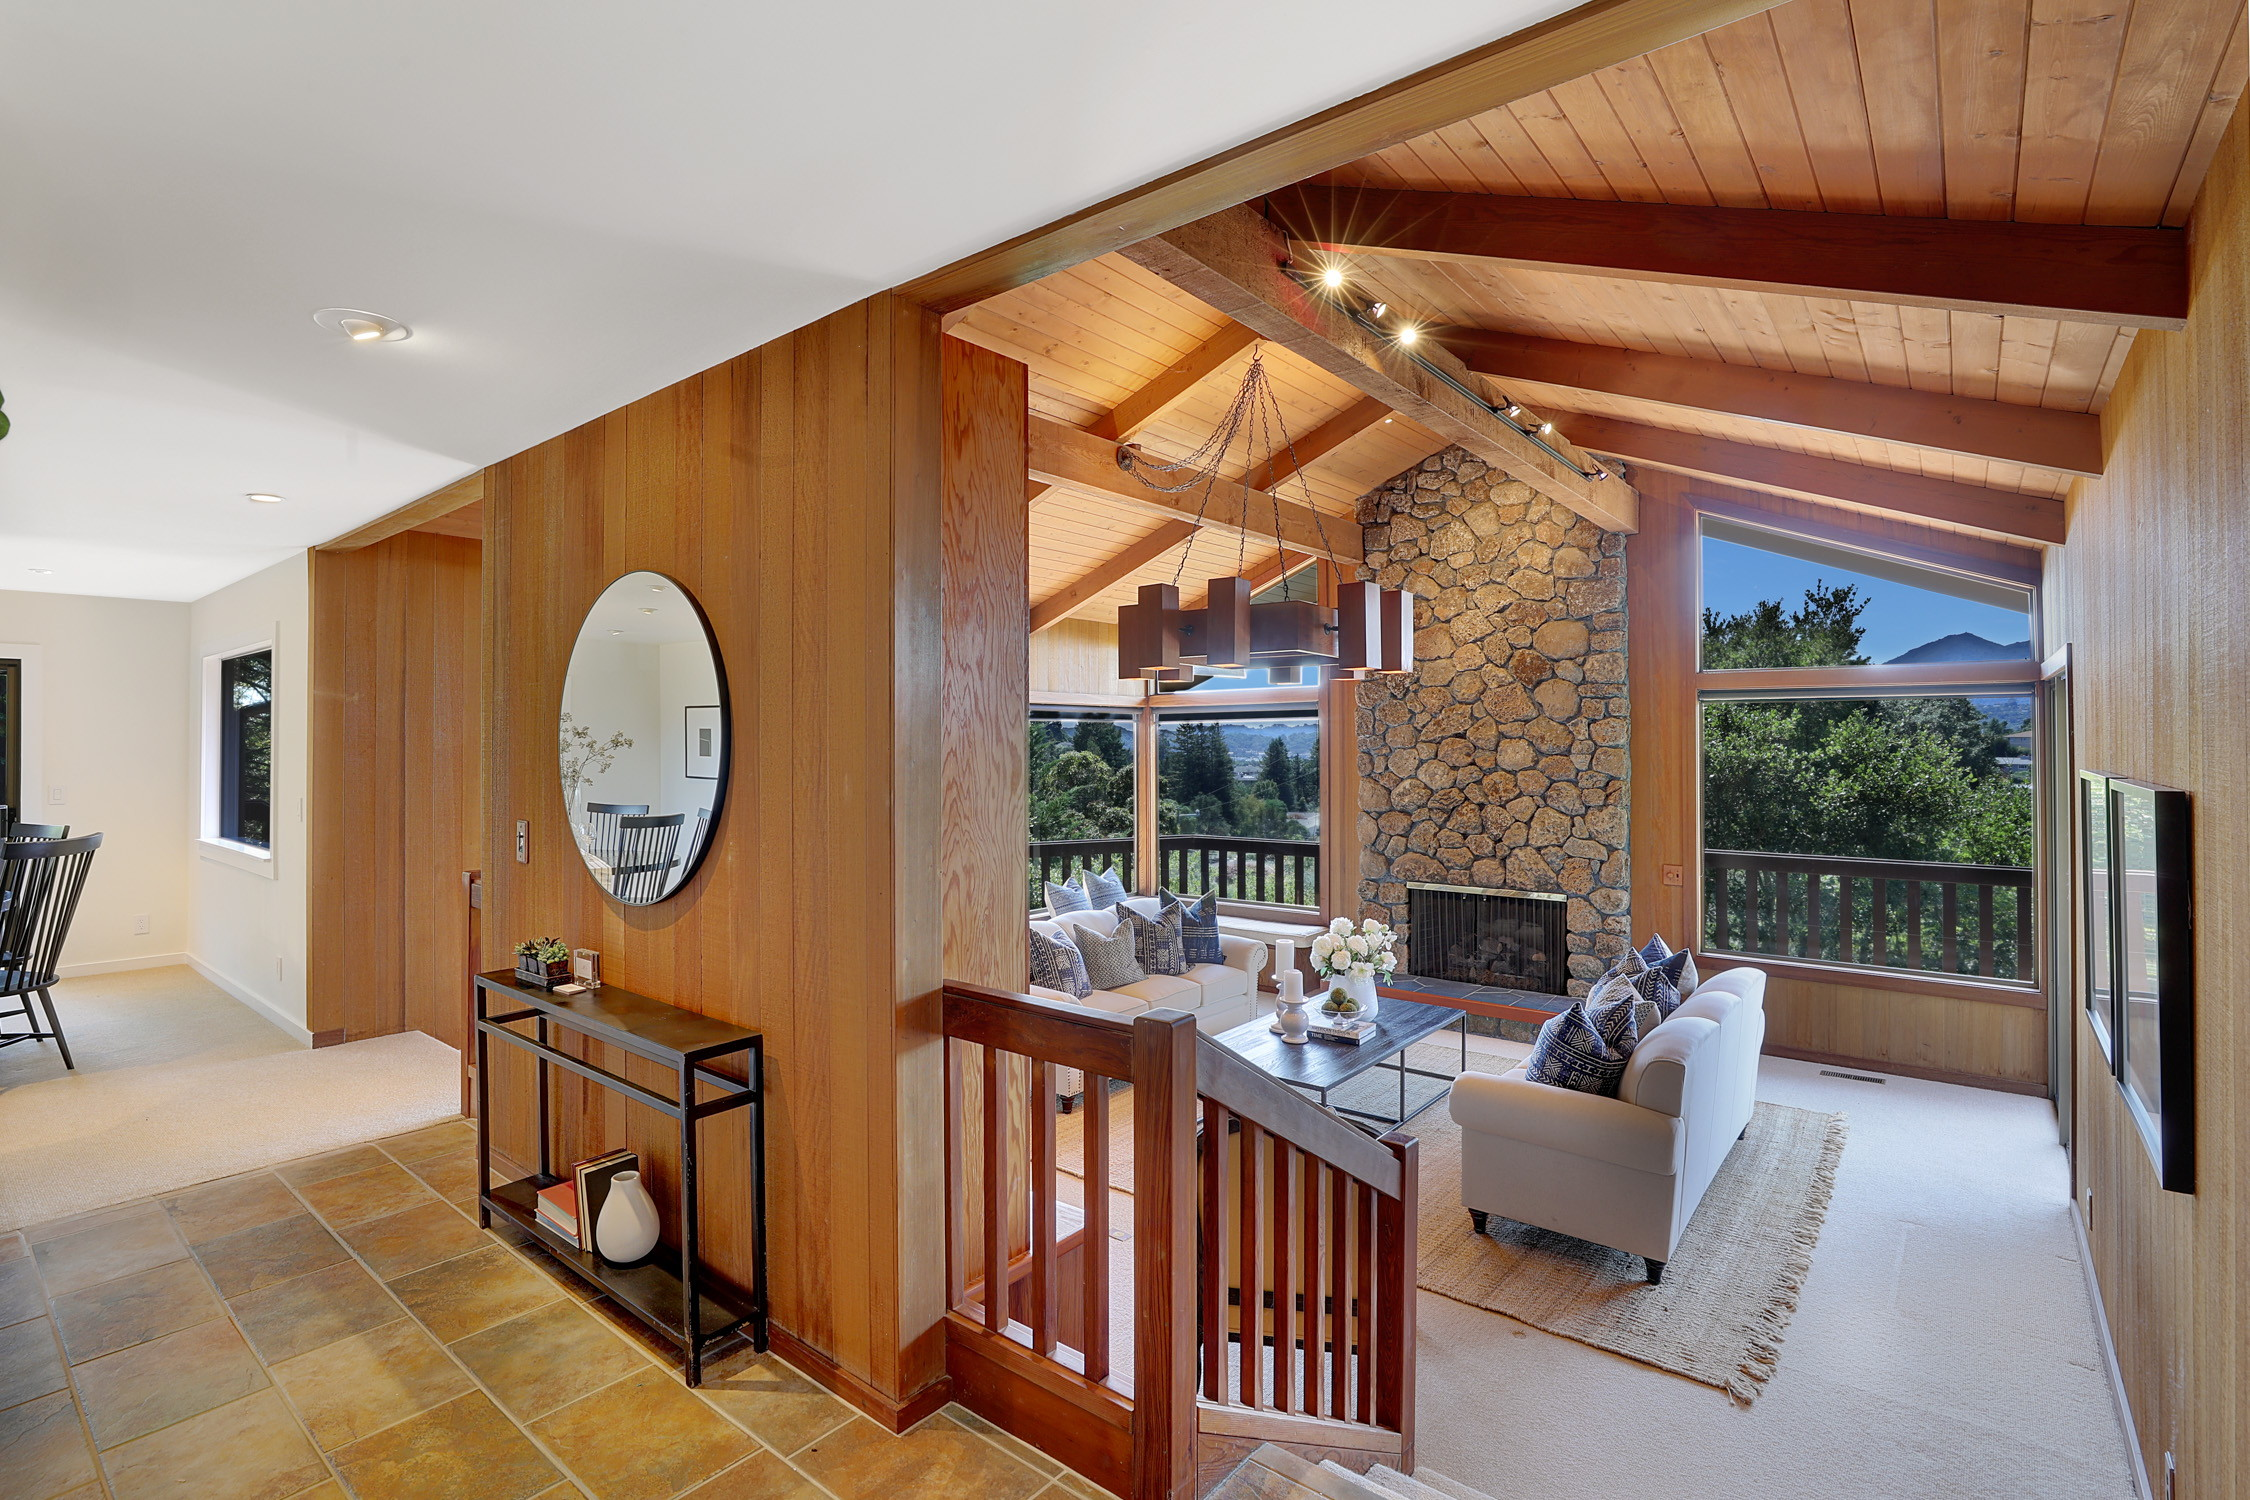 16Dorian 08 MLSSan Rafael Real Estate - Listed by Julia Fitzpatrick + Allie Fornesi Team Own Marin County .jpg